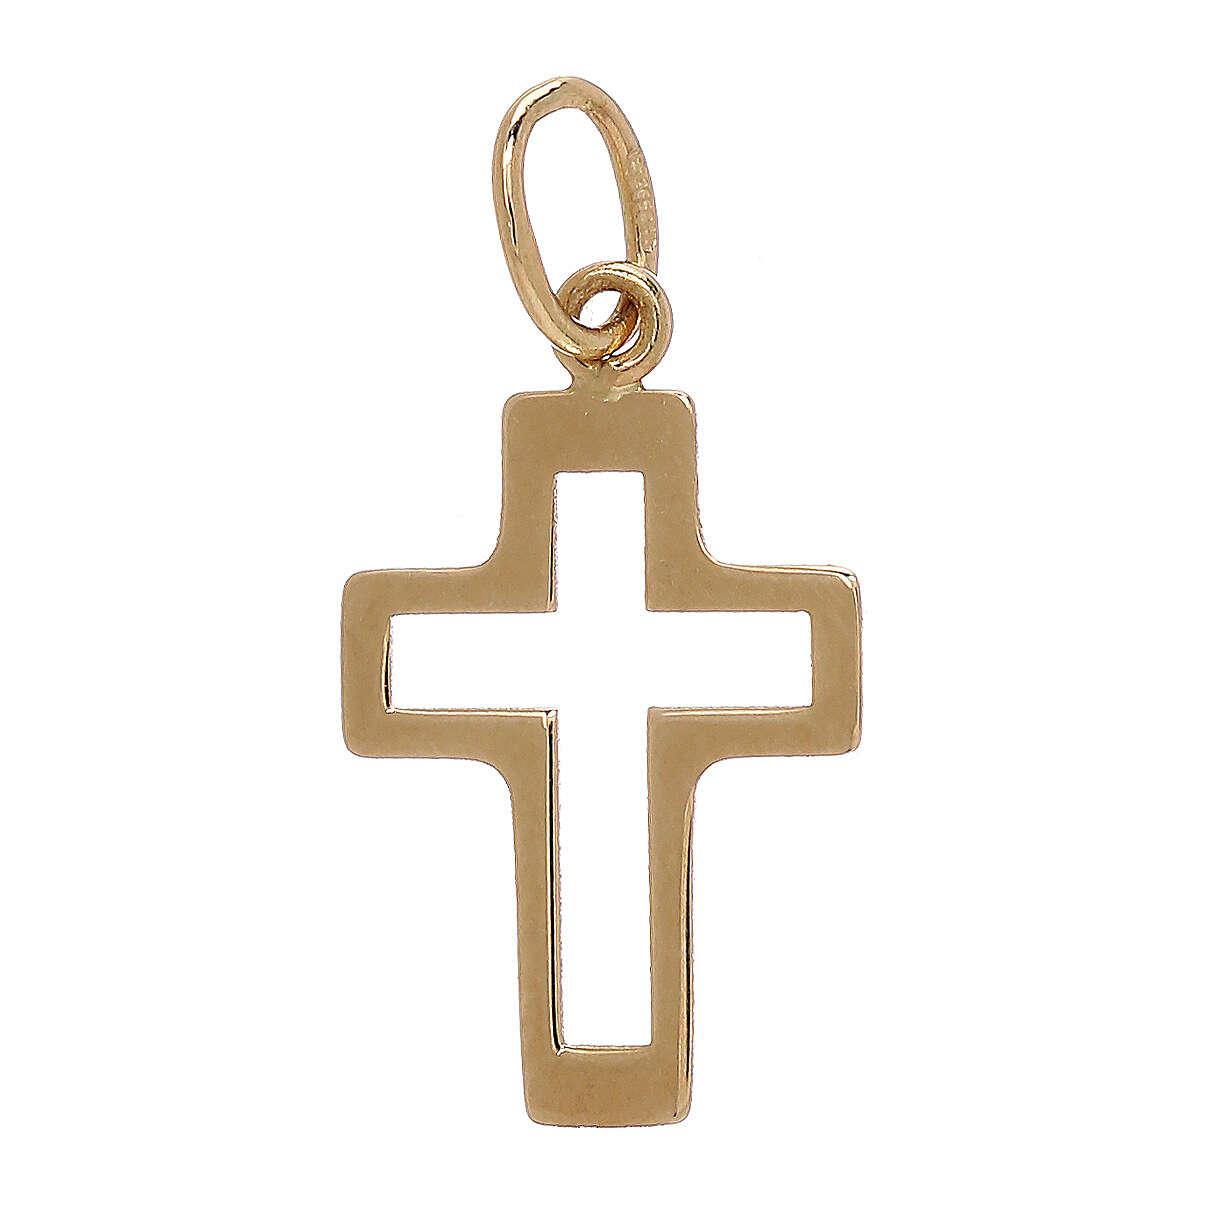 Pendente sagoma croce traforato oro giallo 18 kt 0,35 gr 4